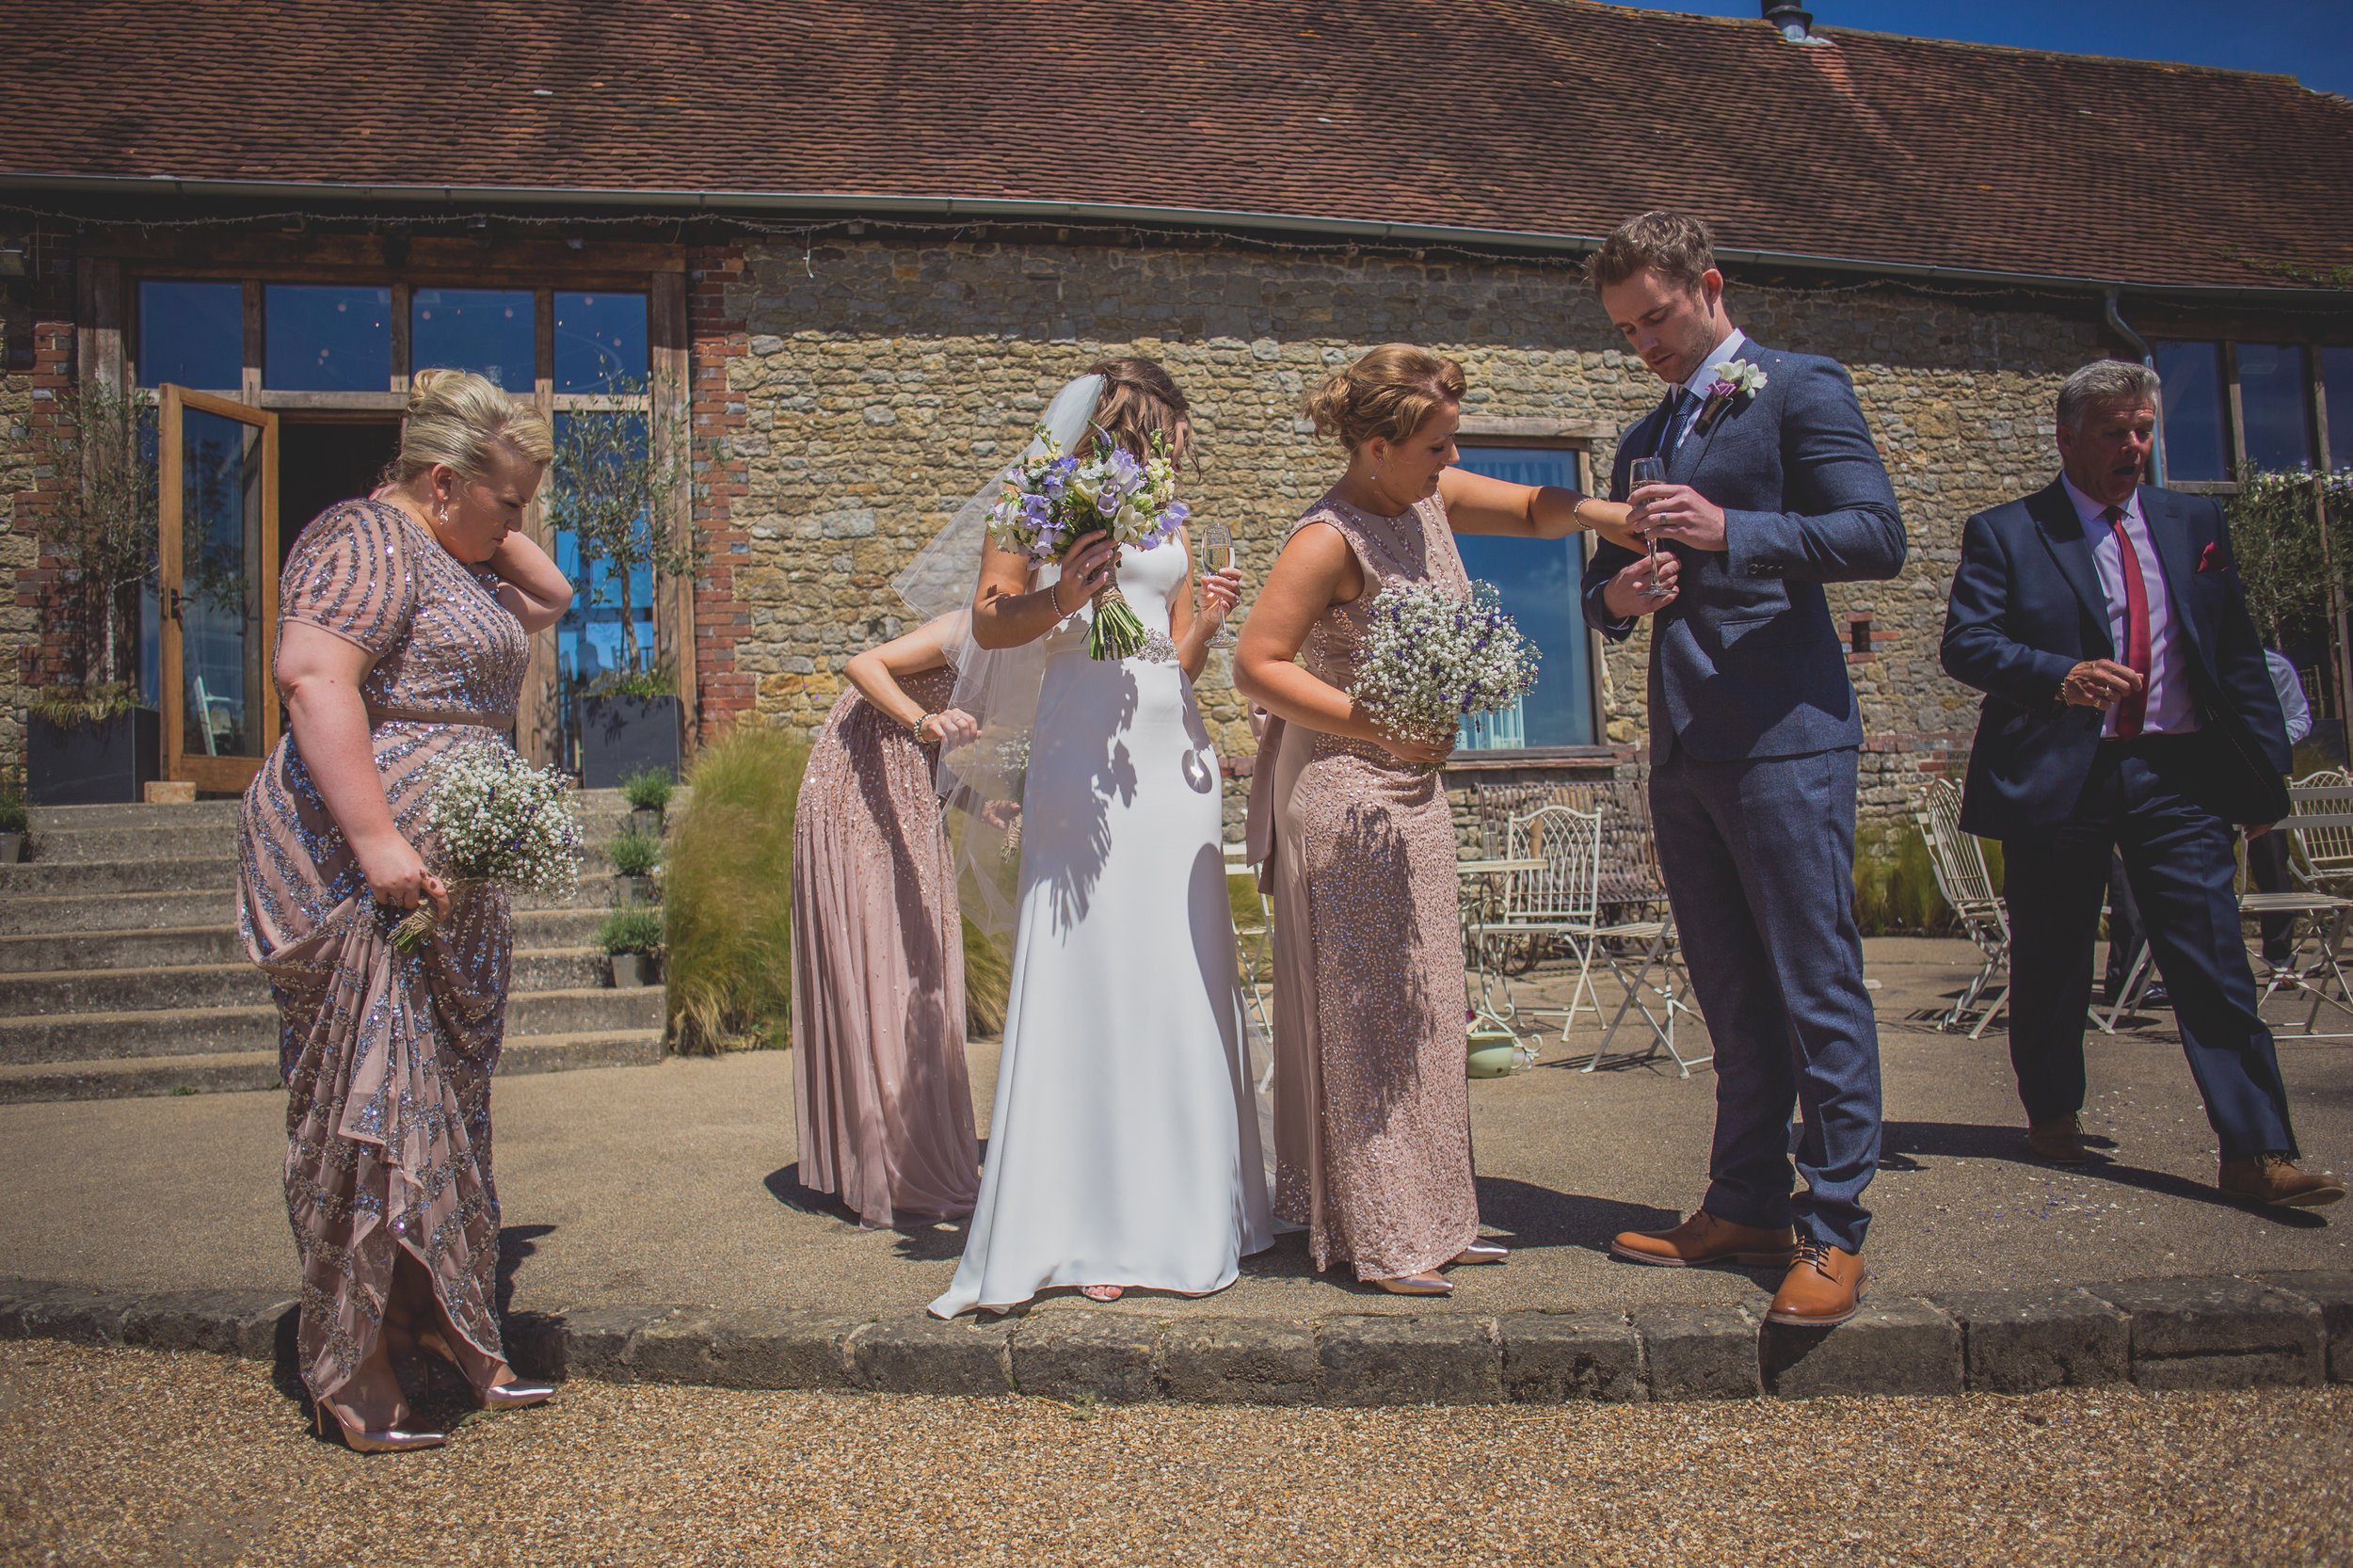 Grittenham Barn female wedding photographers west sussex petworth social-83.jpg